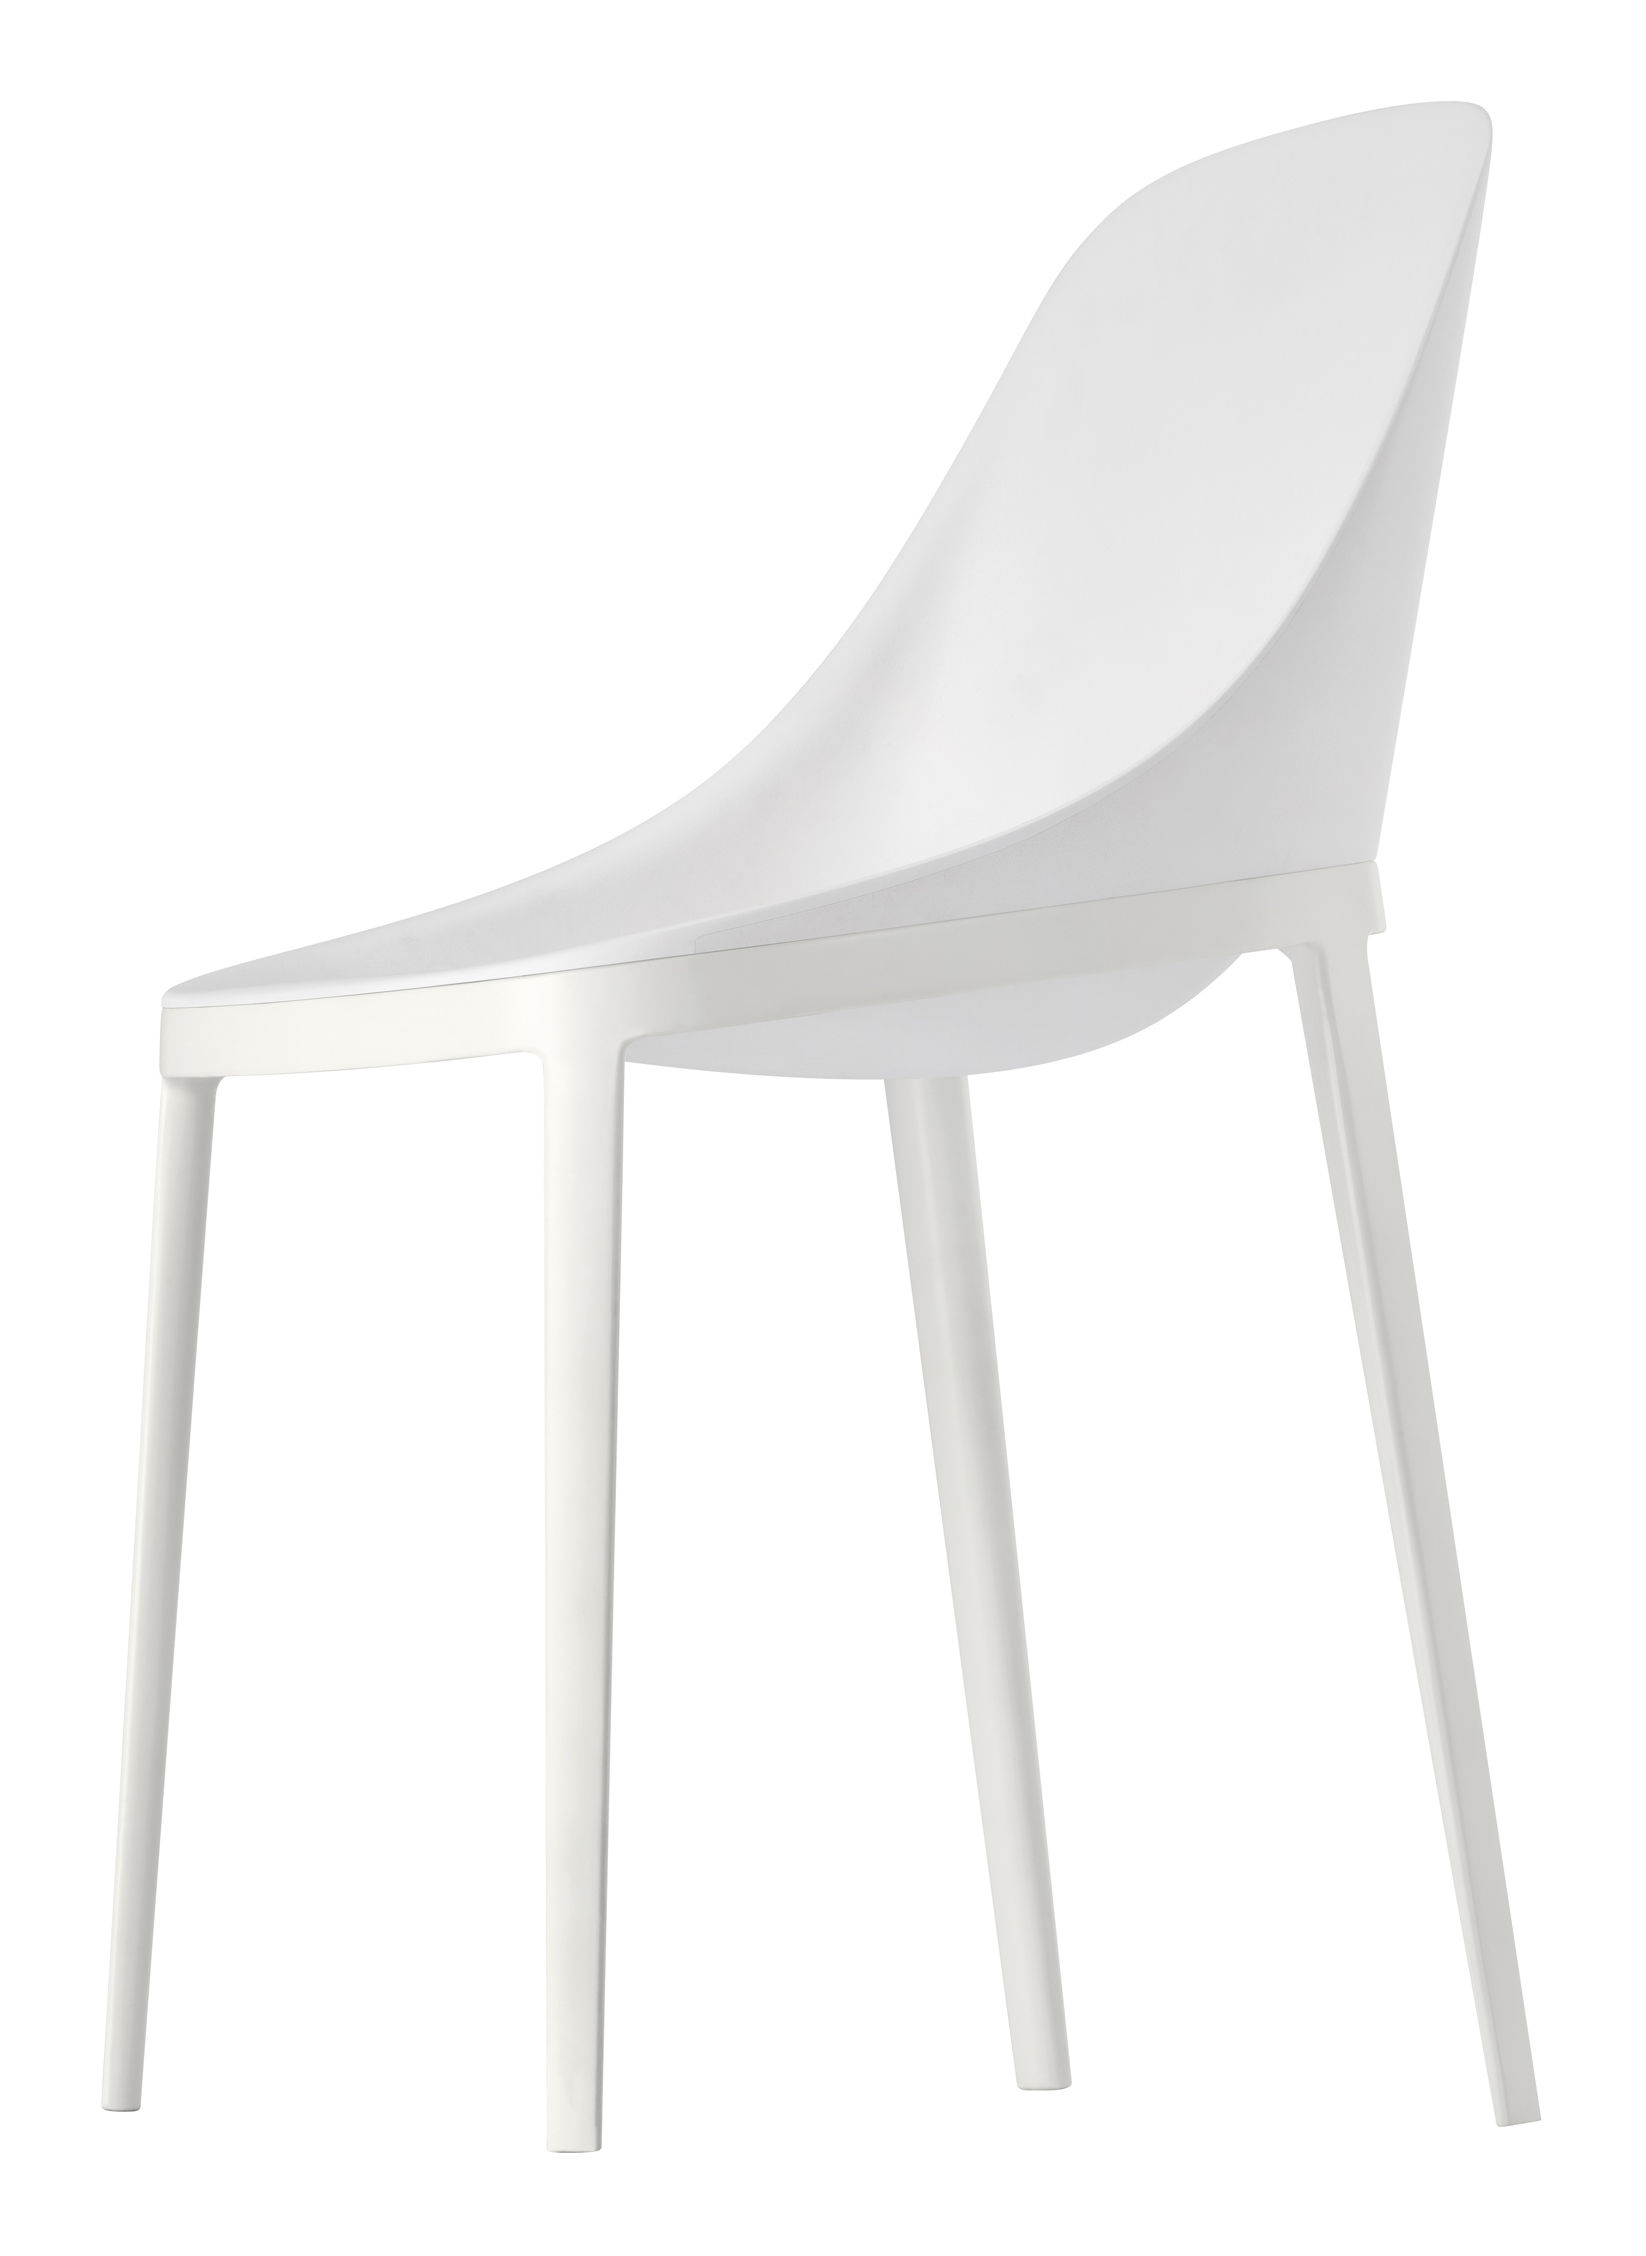 Chaise Elle Assise Polyurethane Pieds Metal Polyuretahne Blanc